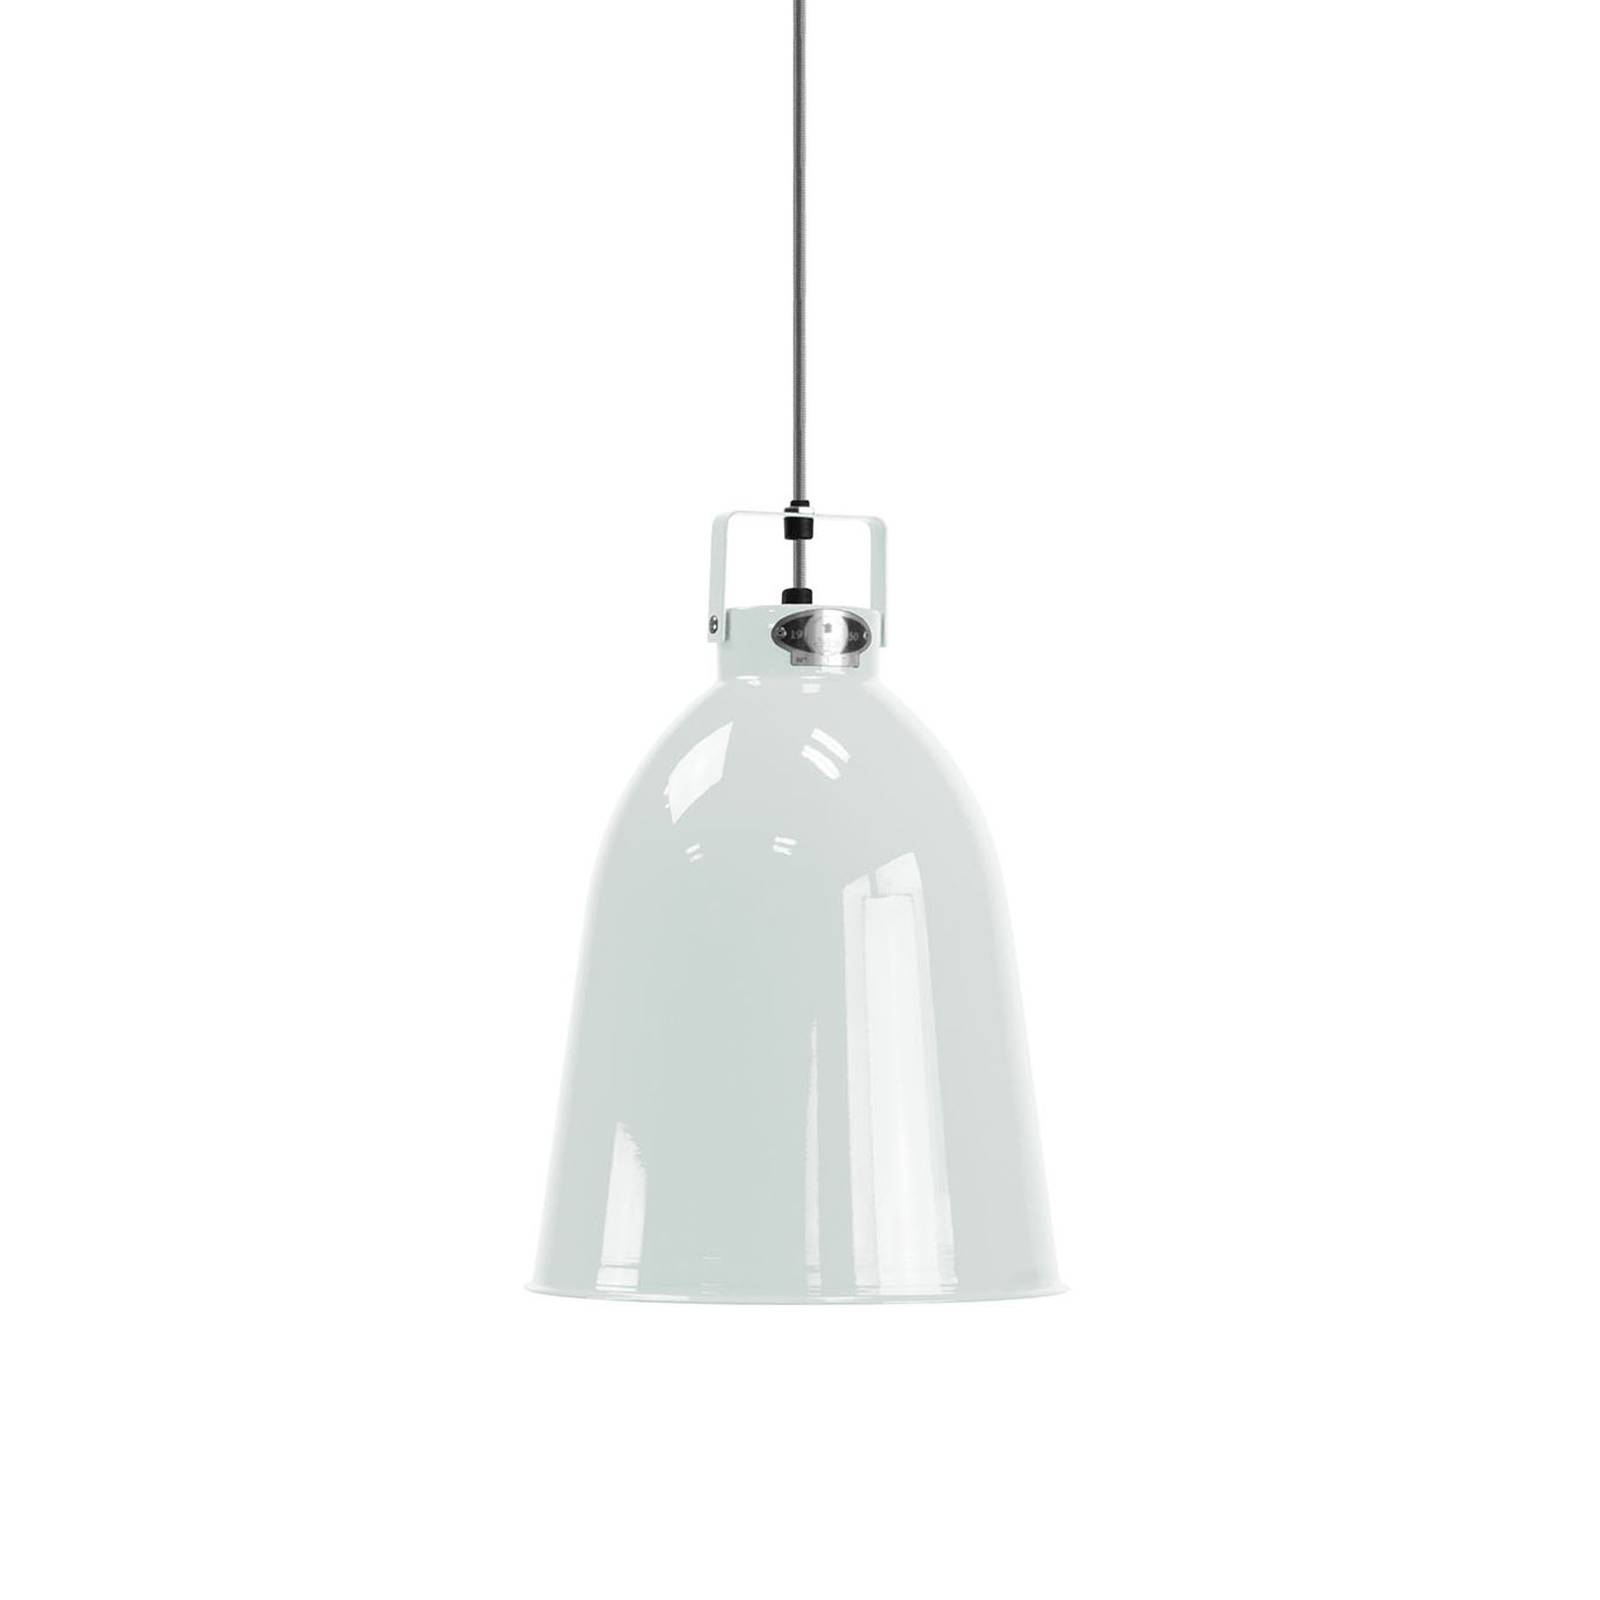 Jieldé Clément C240 -riippuvalo valkoinen Ø 24 cm